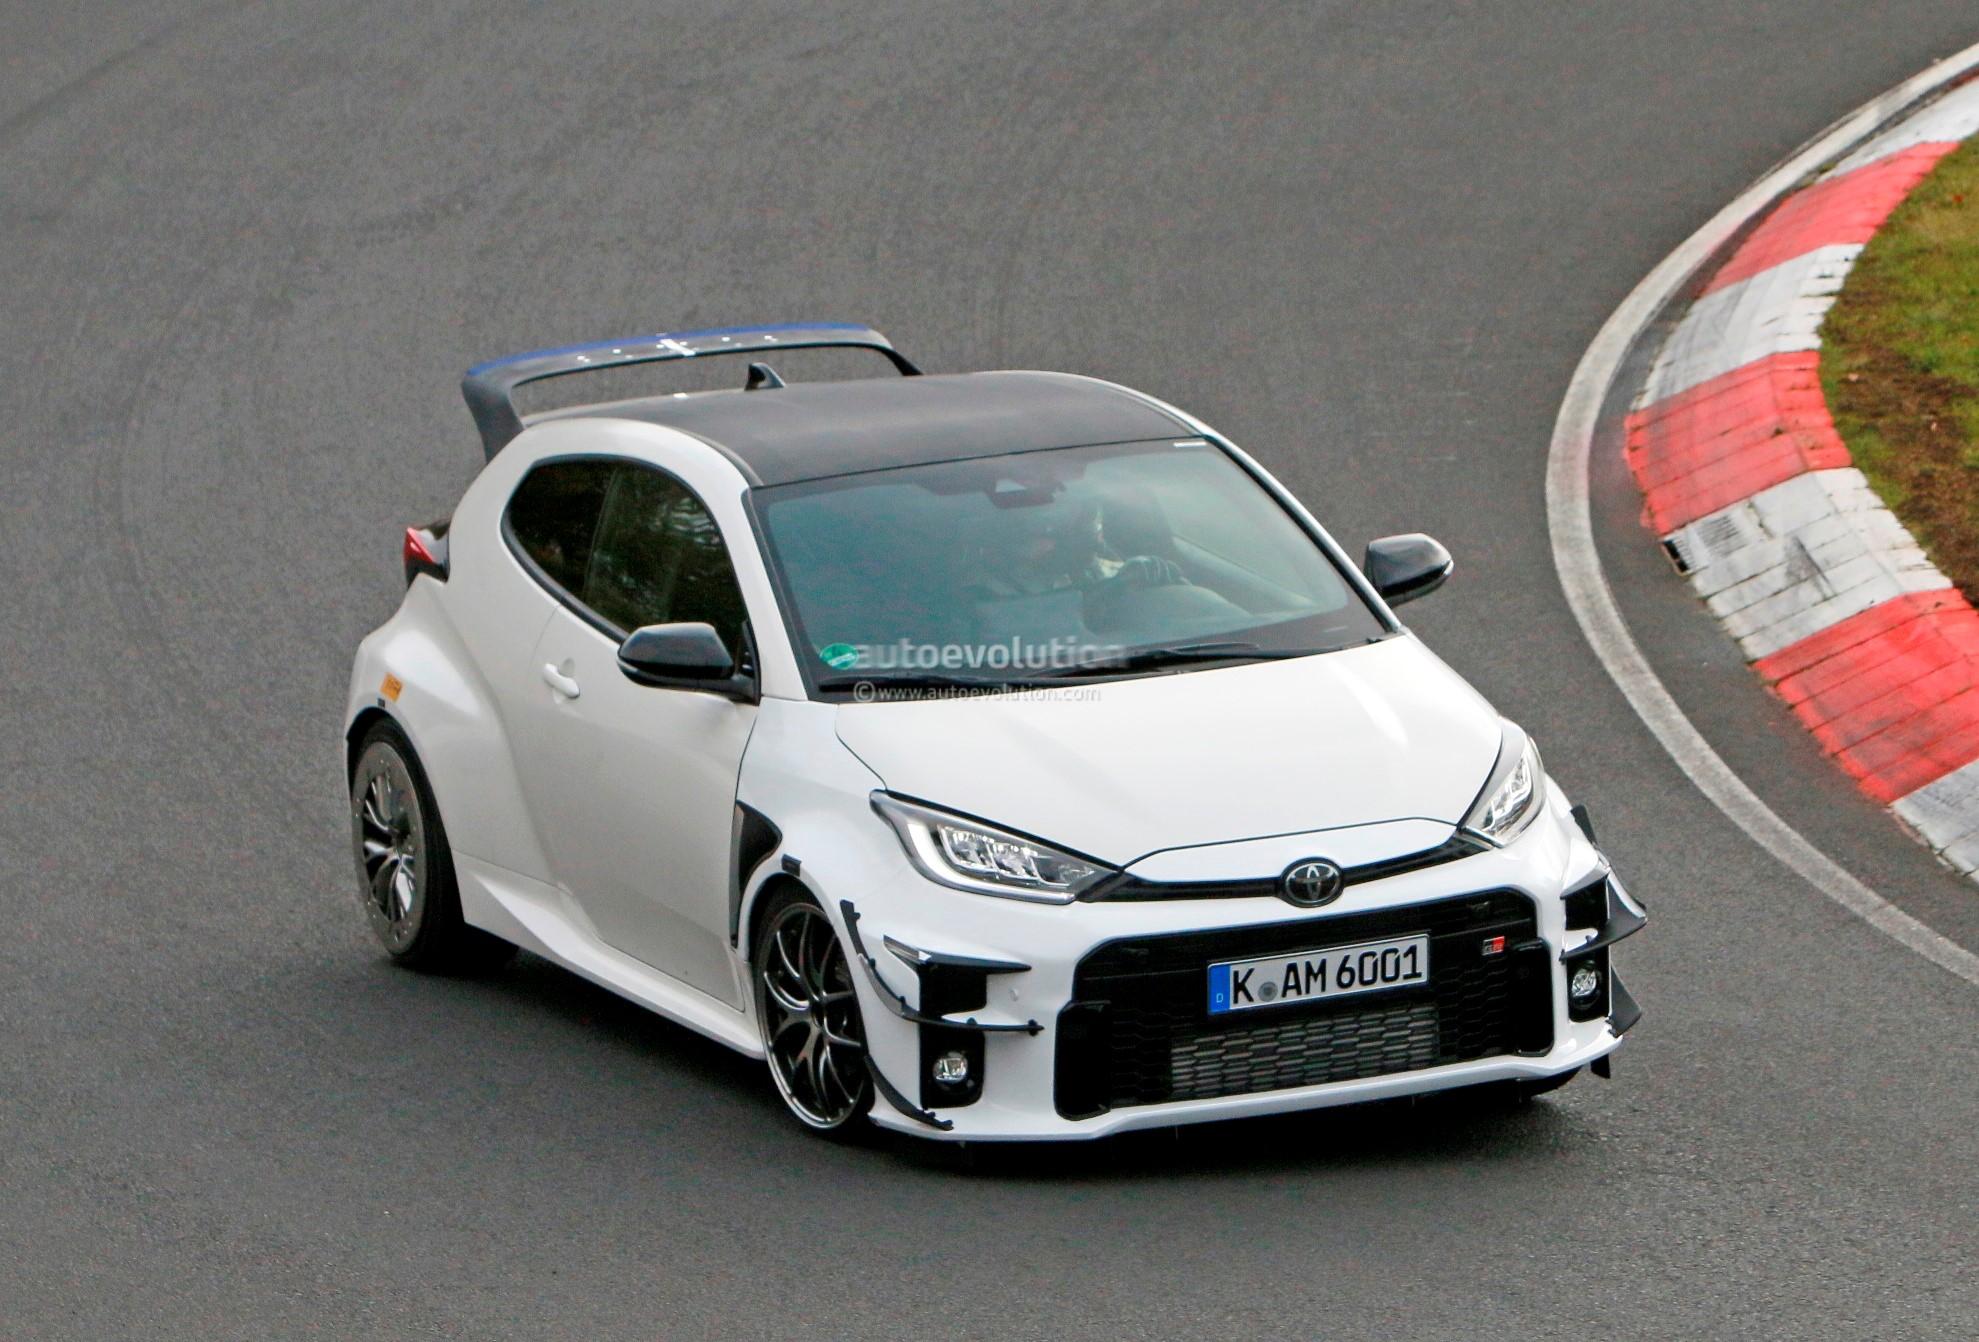 Hotter 2021 Toyota GRMN Yaris Caught Testing at the Nurburgring -  autoevolution